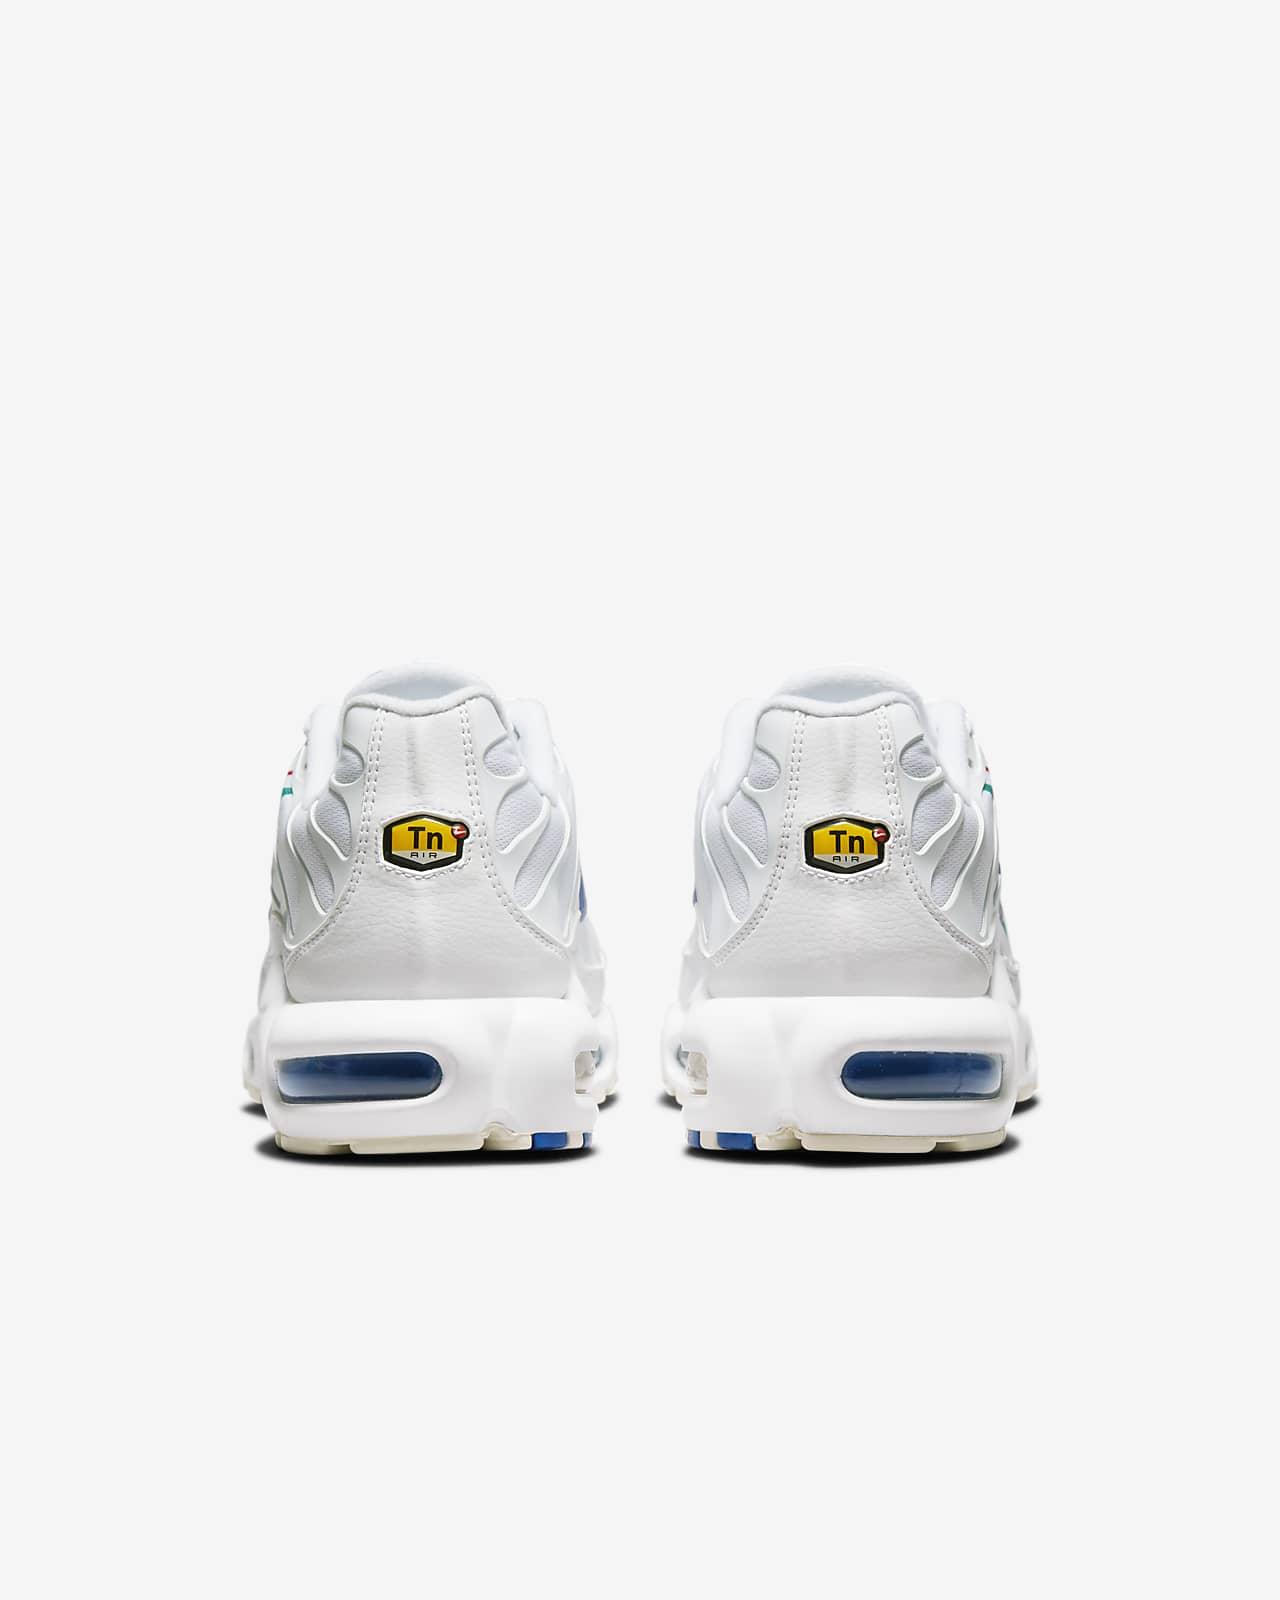 Nike Air Max Plus Mens Shoes